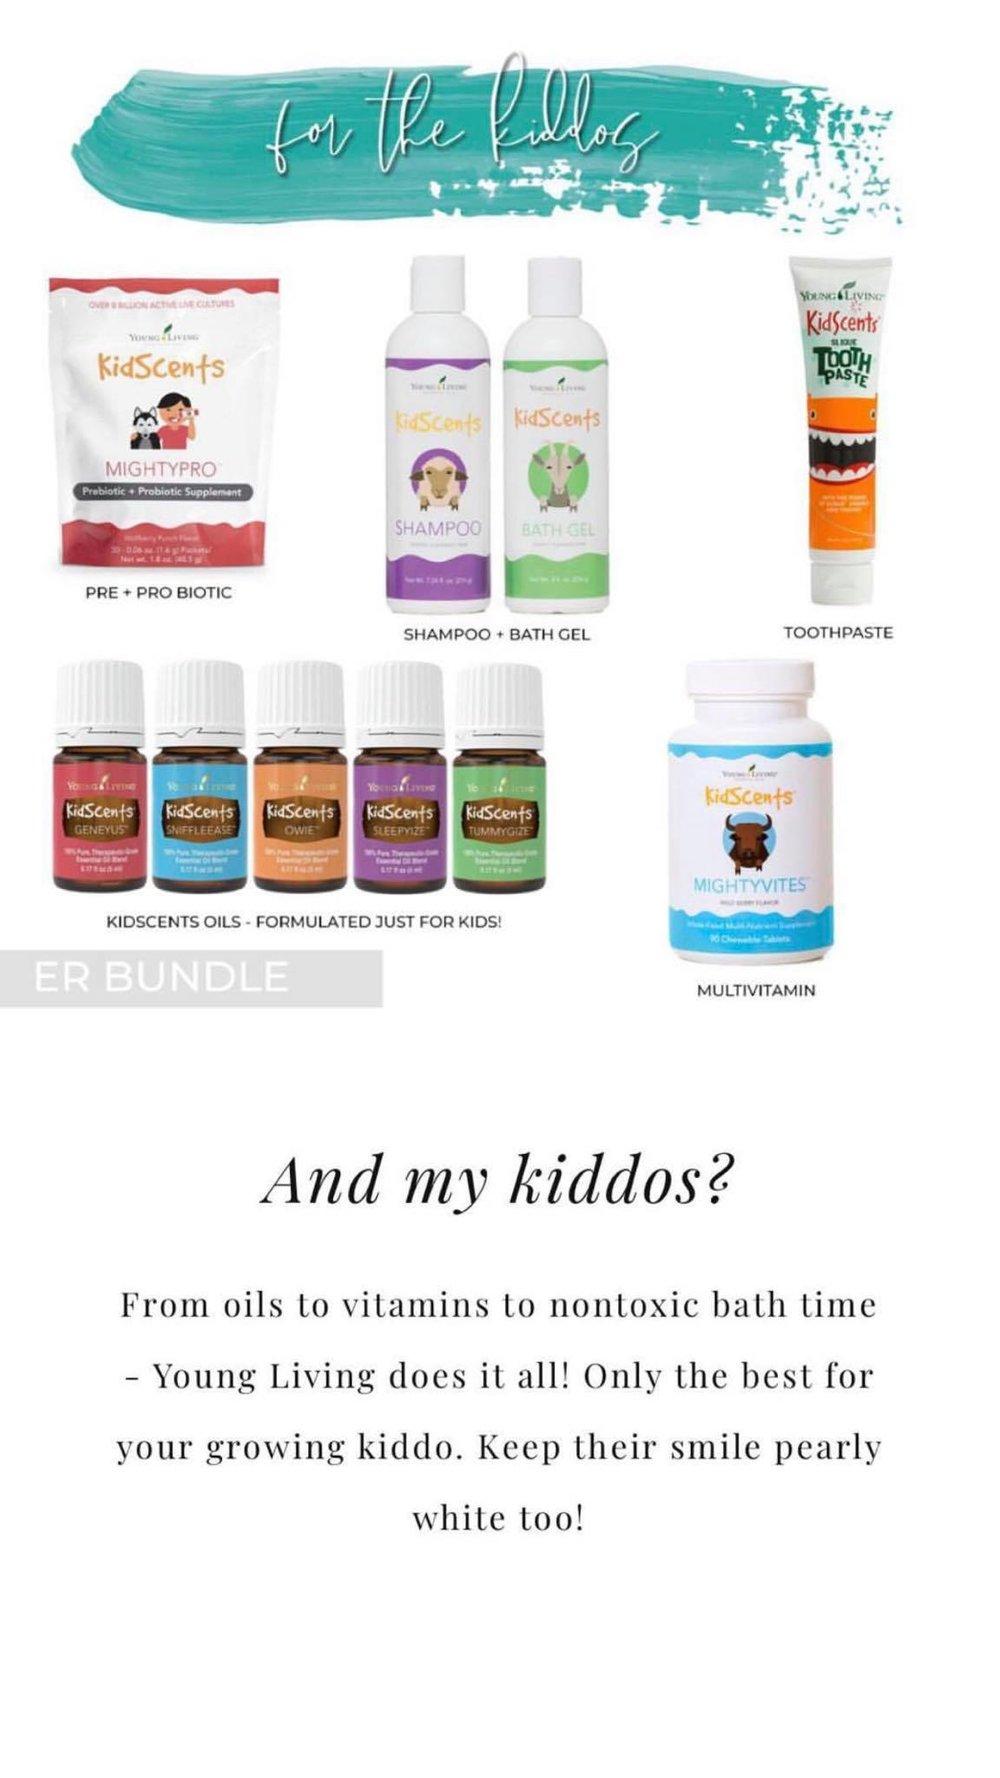 essential rewards kit - for the kids.jpg